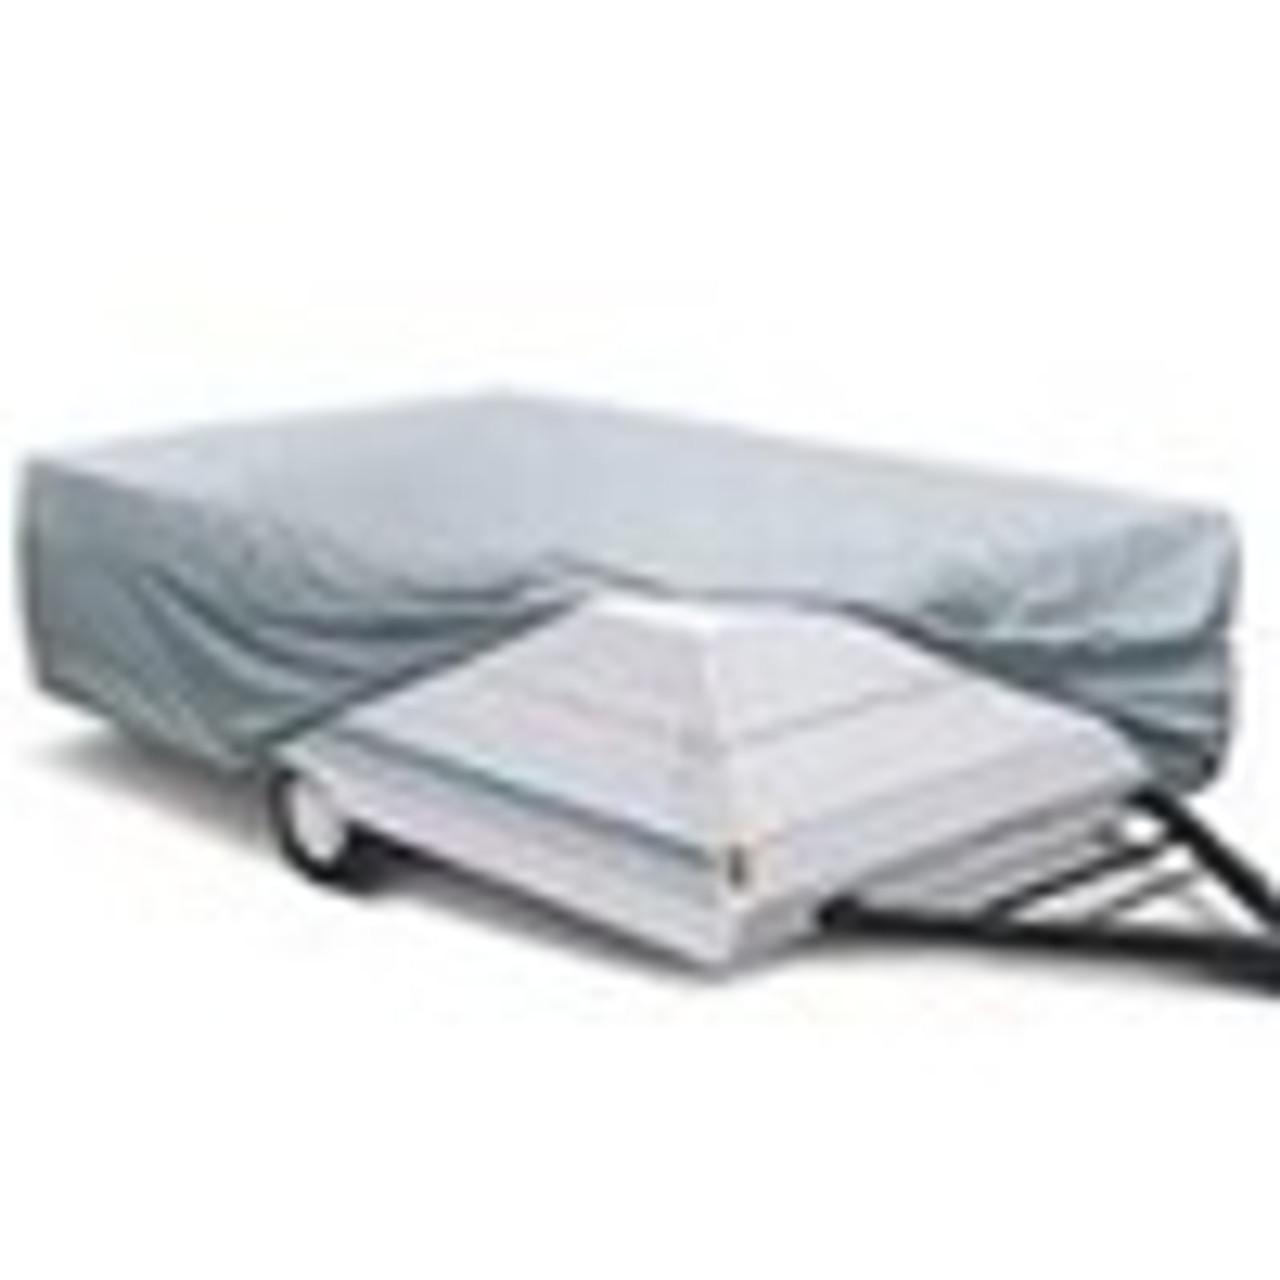 Polypropylene Folding Camping Trailer Cover